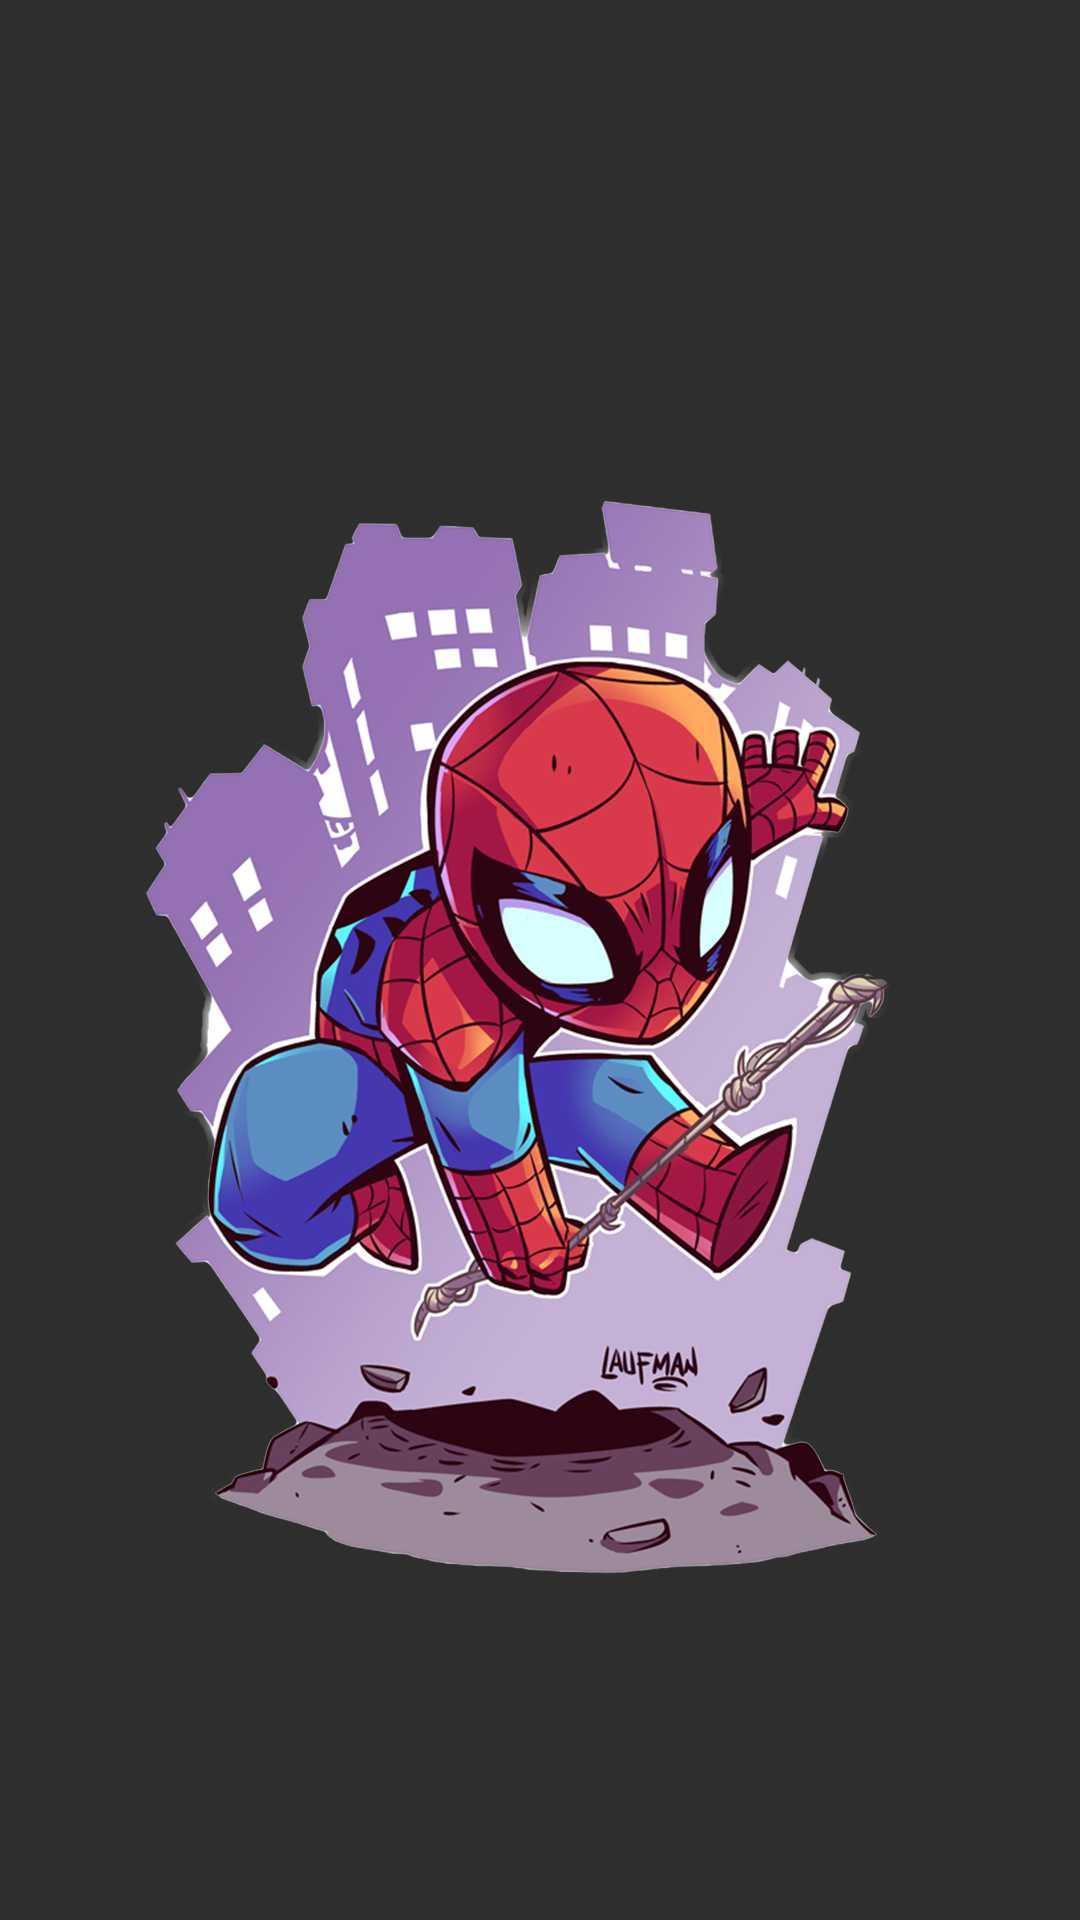 Spiderman Animated Art iPhone Wallpaper